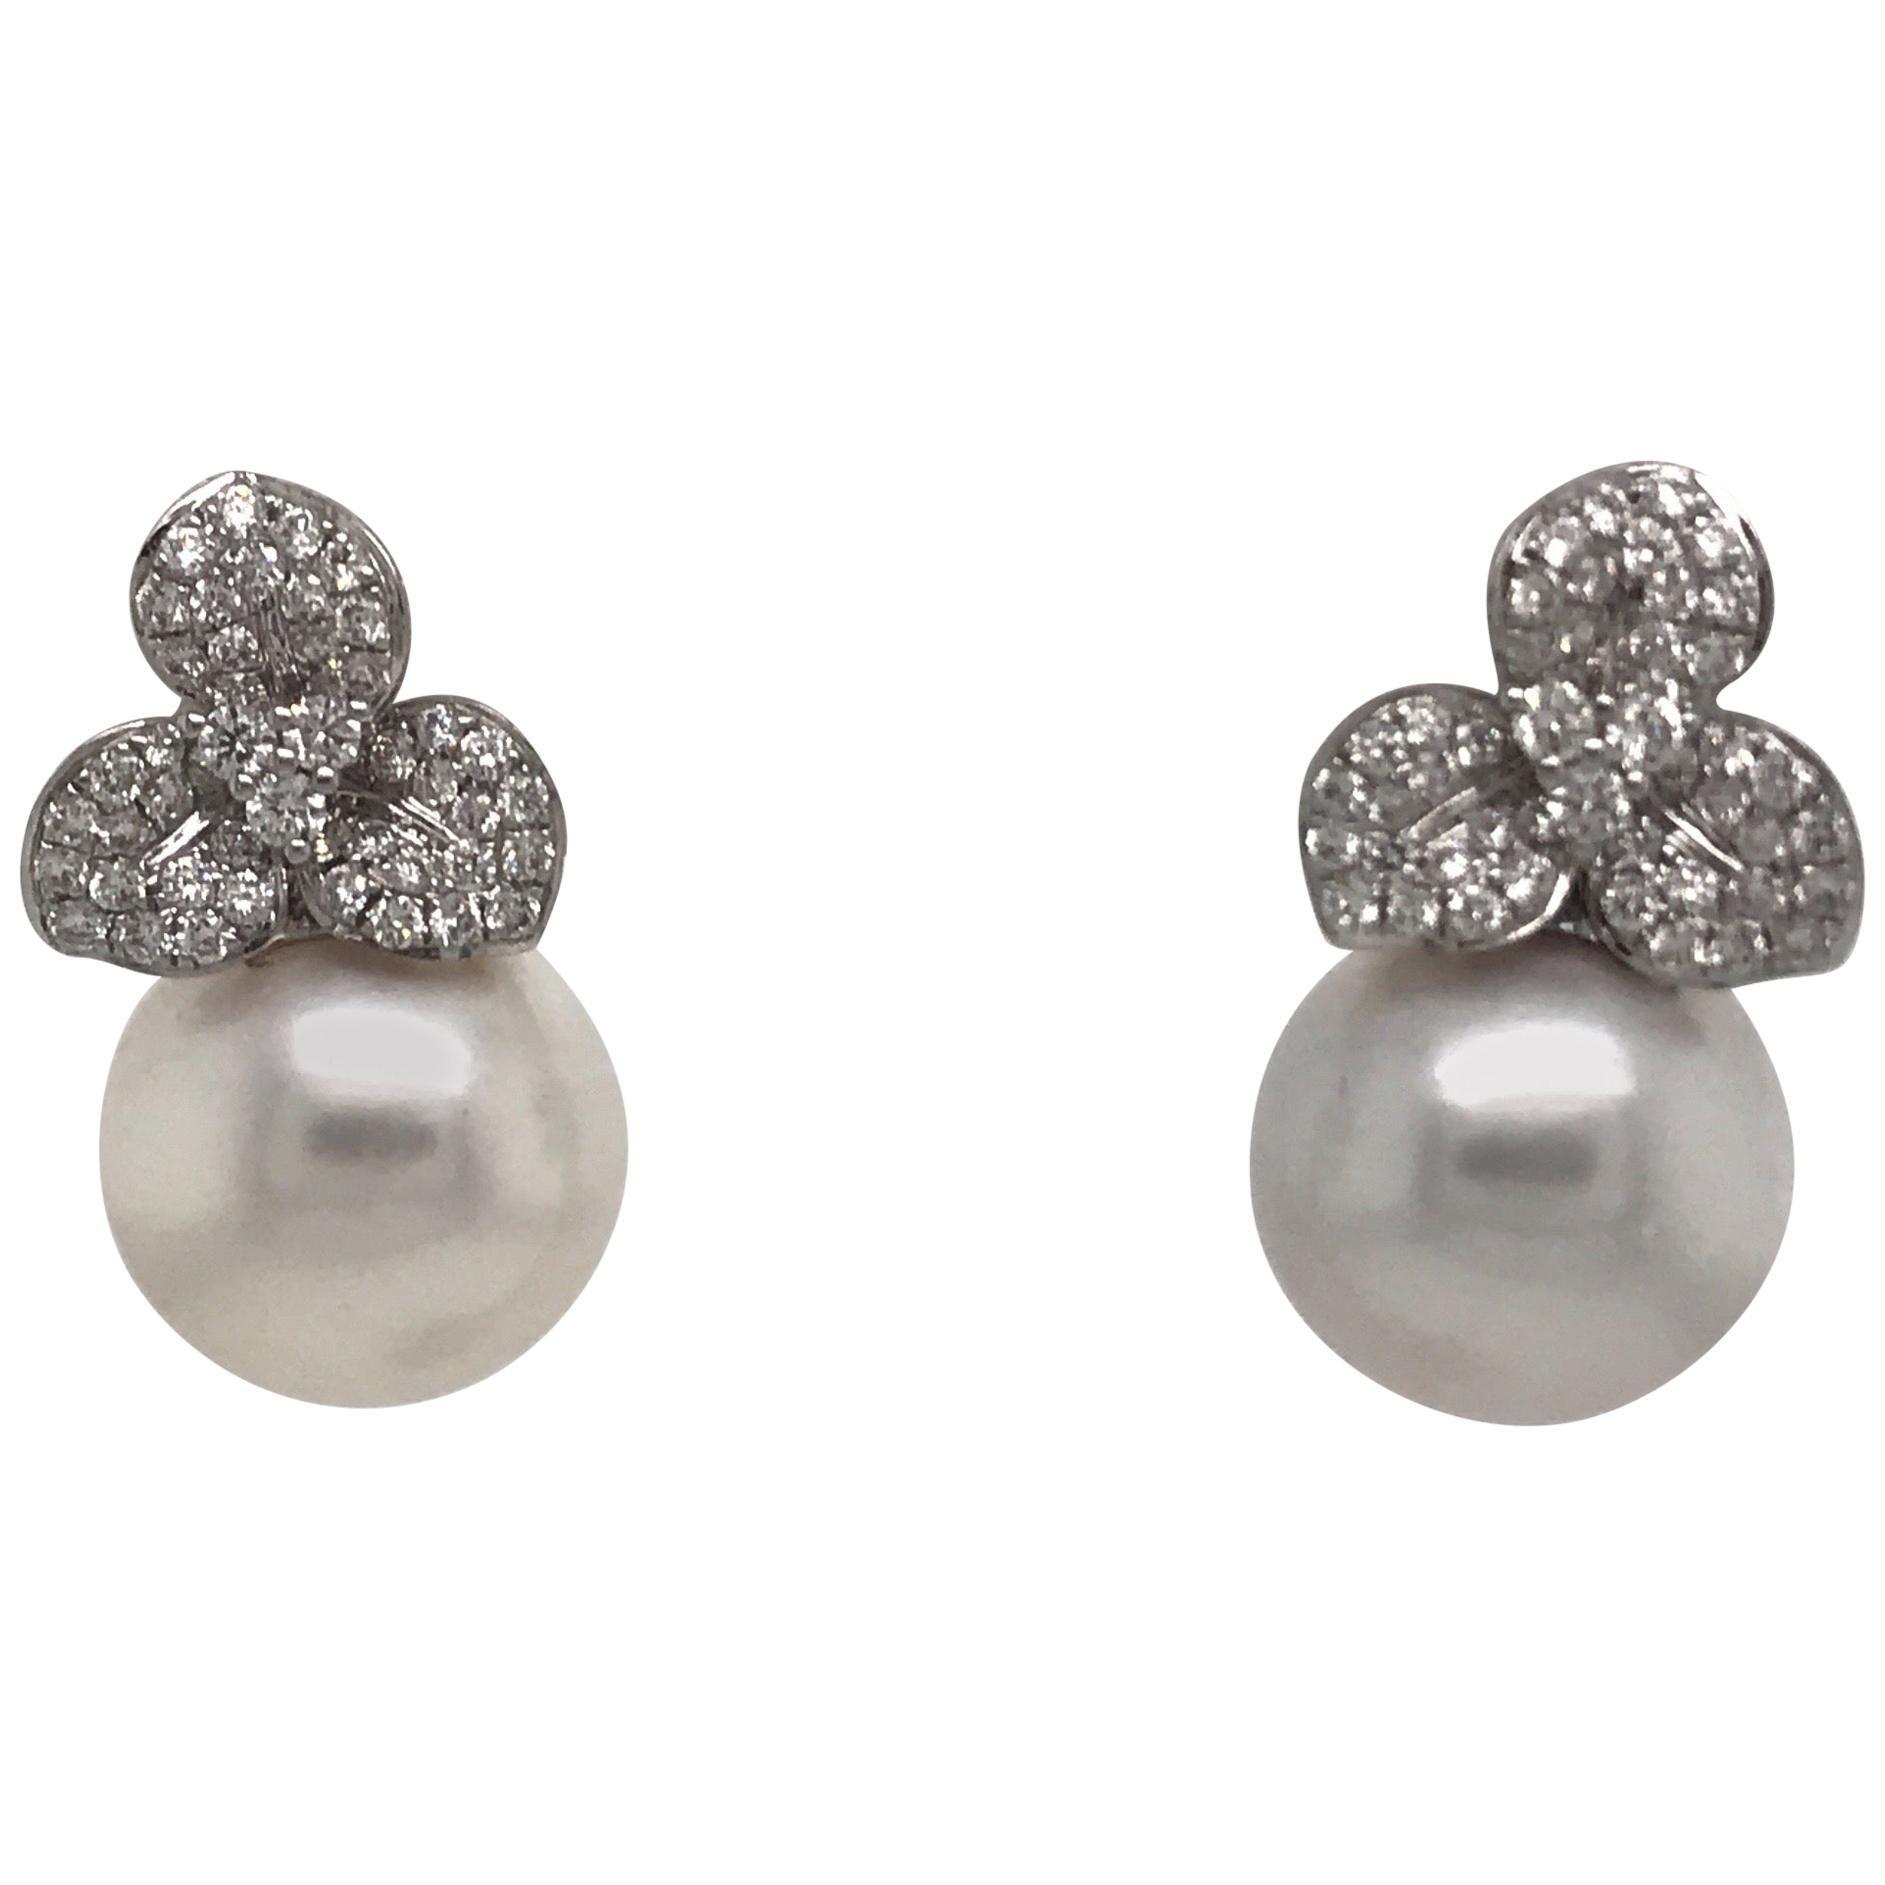 Diamond Floral South Sea Pearl Earrings 0.88 Carat 18 Karat White Gold